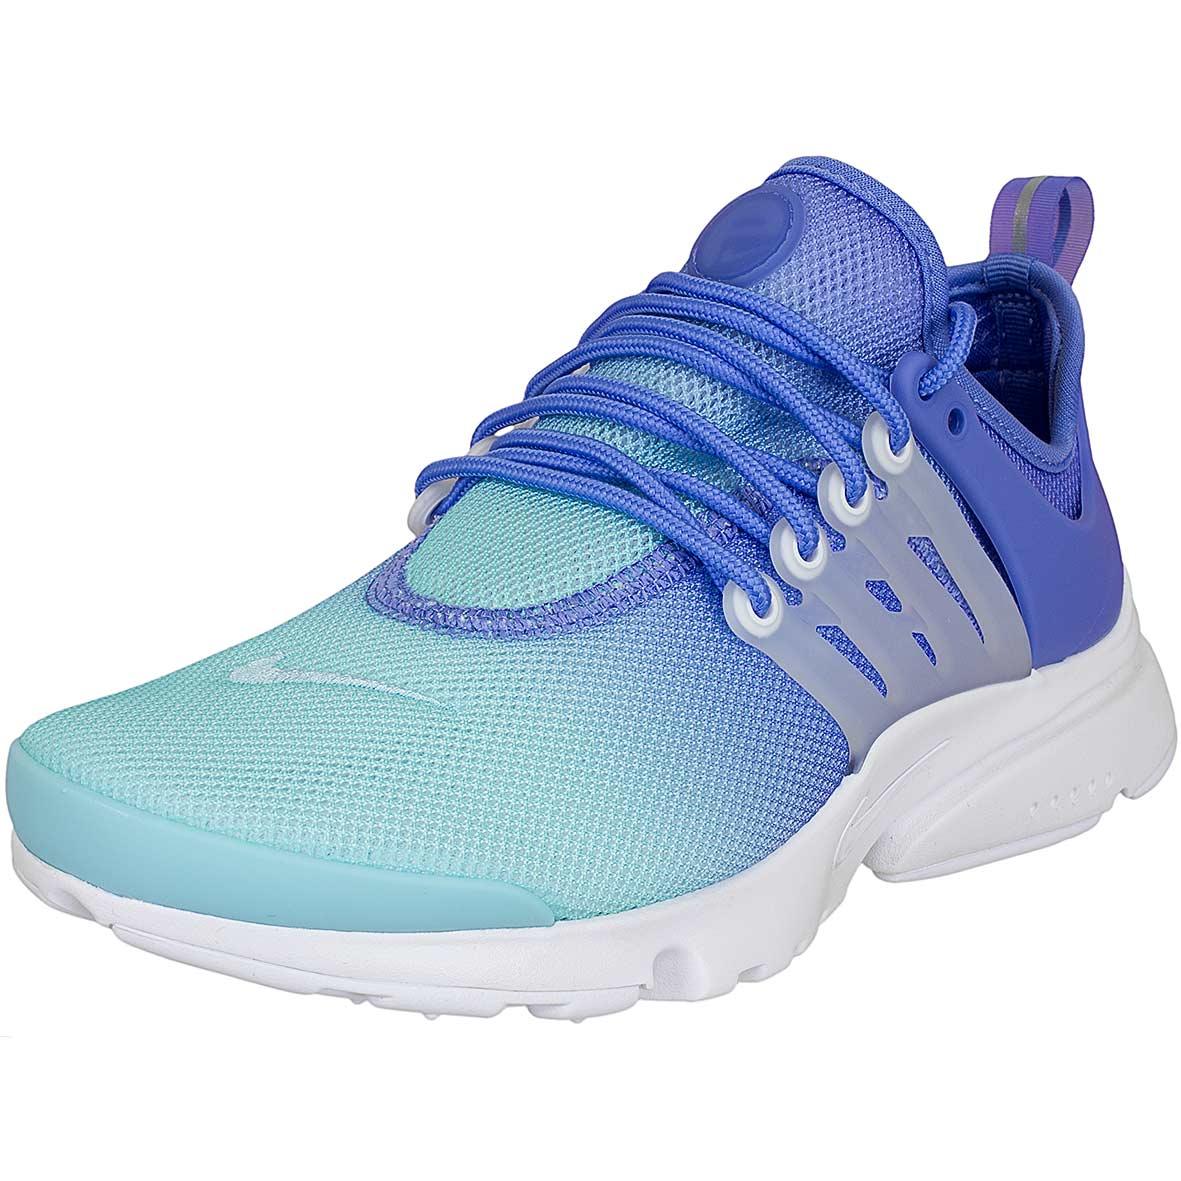 ☆ Nike Damen Sneaker Air Presto Ultra BR blau/weiß - hier bestellen!